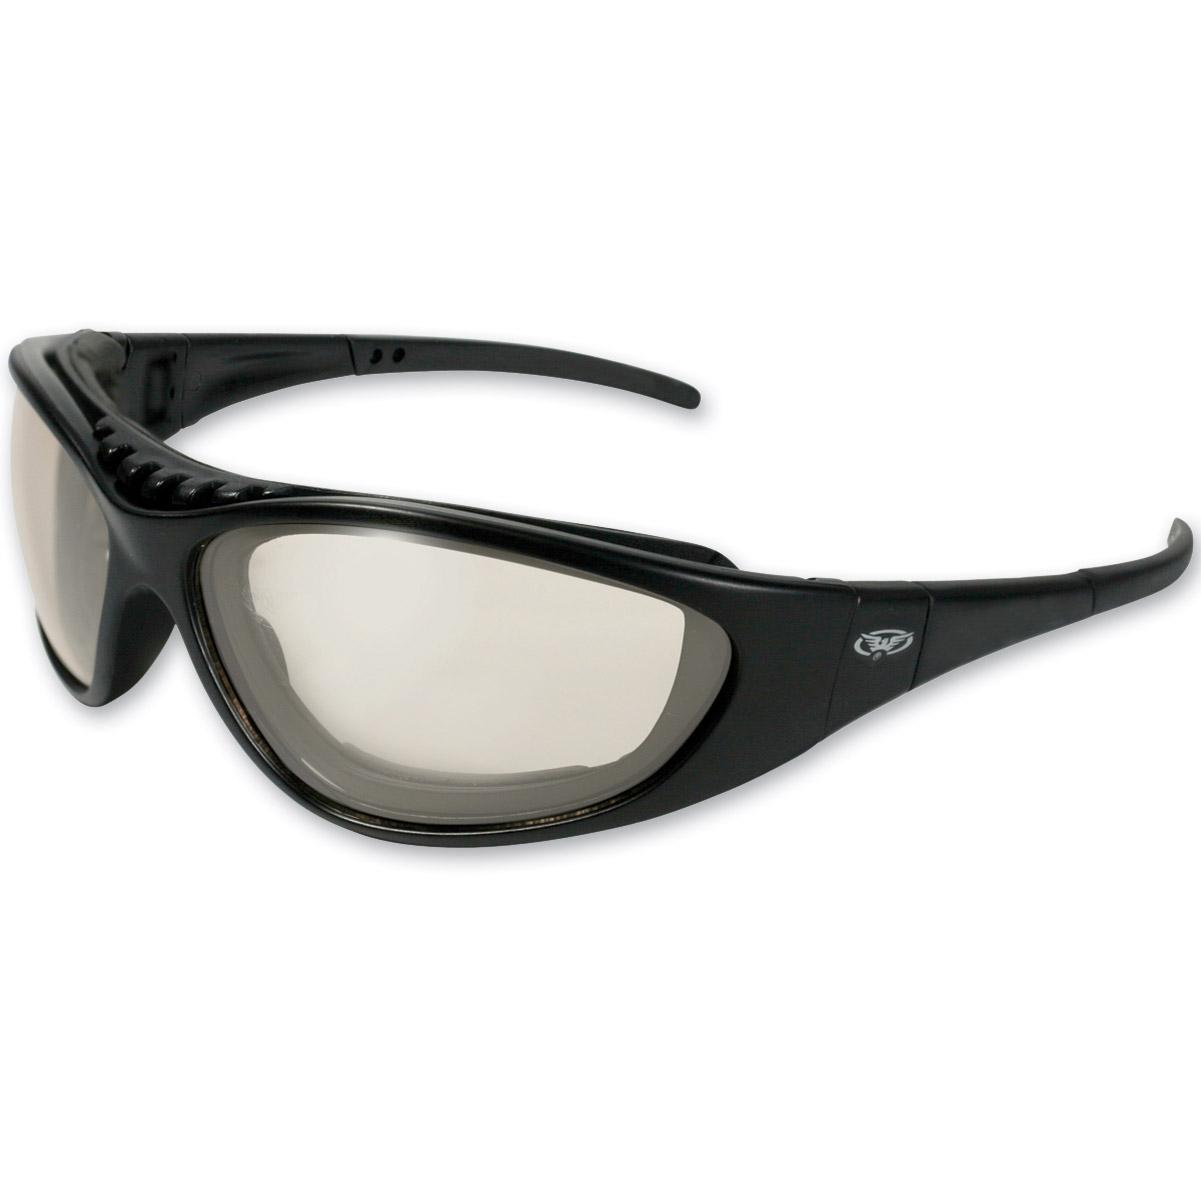 Global Vision Eyewear Clear Photochromic Sunglasses